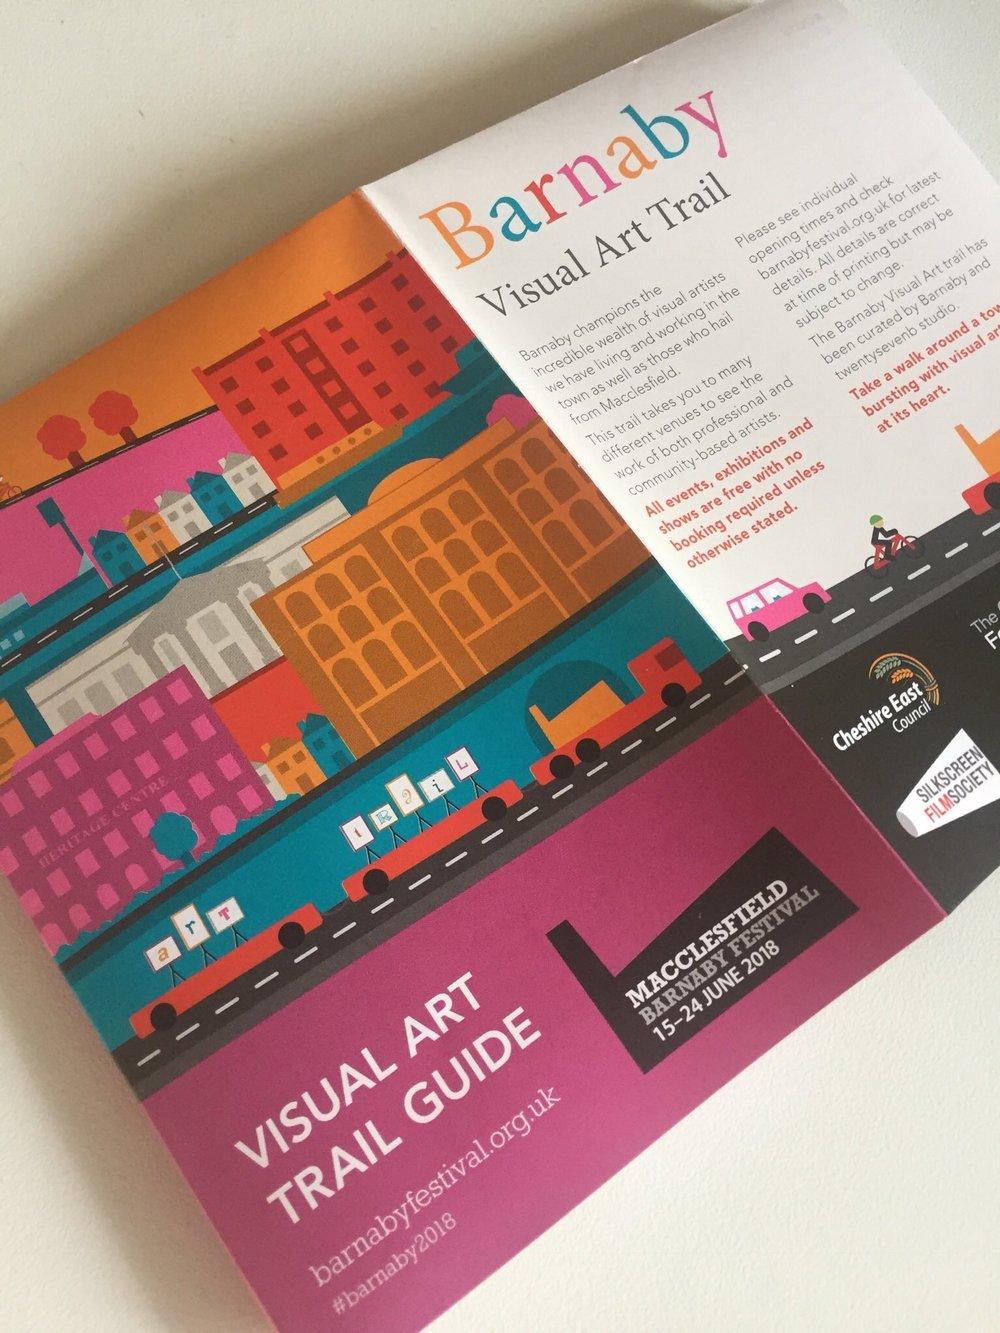 Visual Art Trail Guide